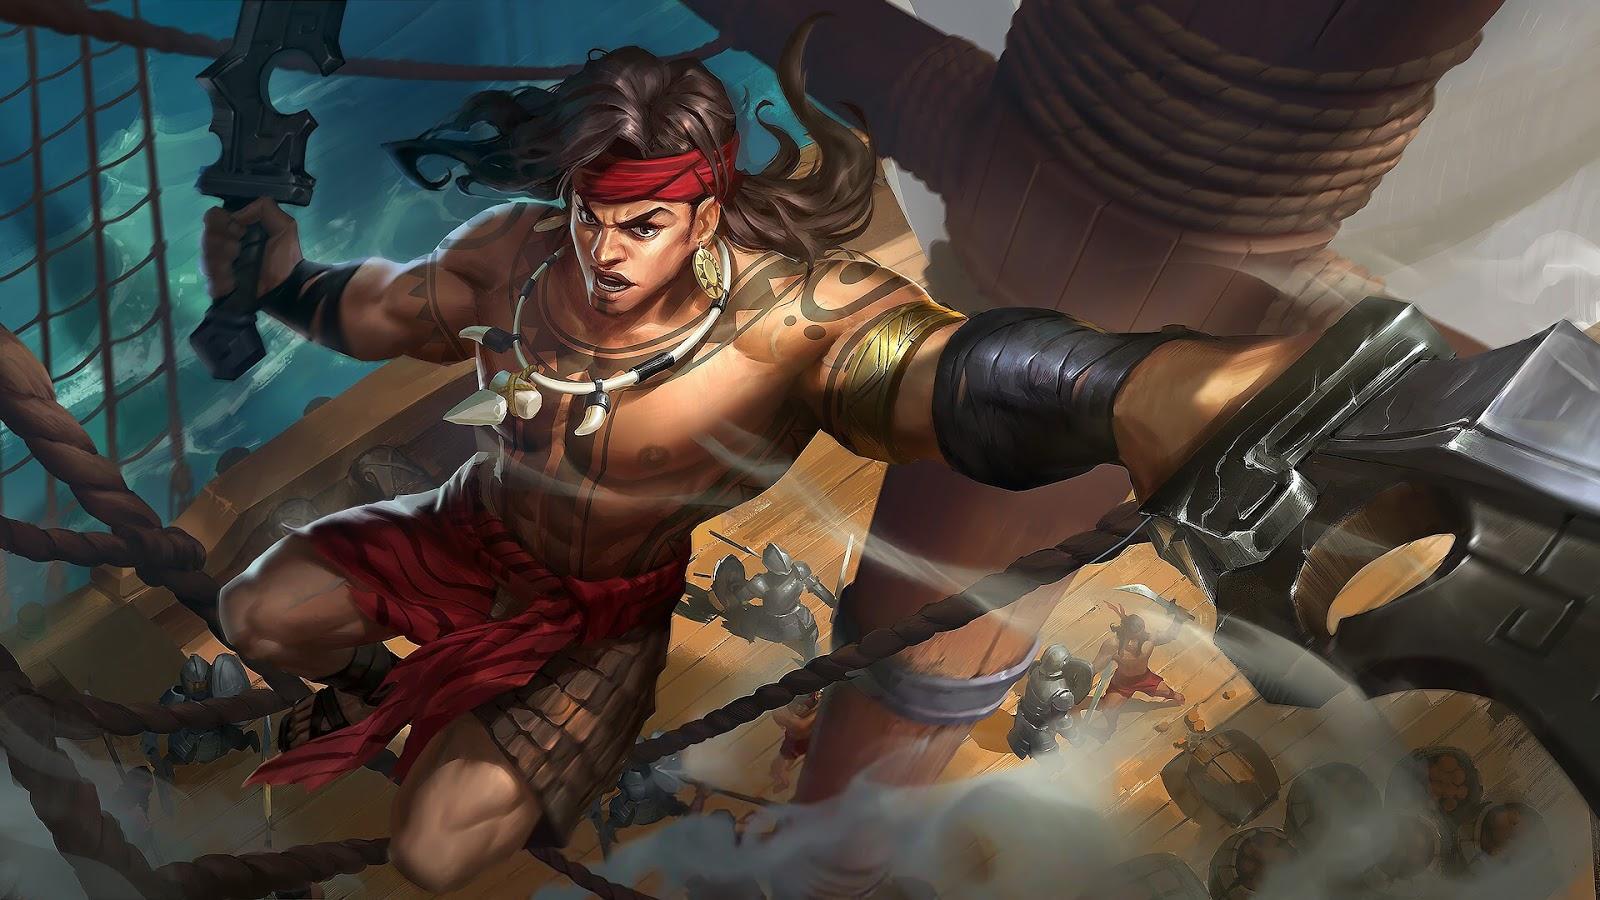 Wallpaper Lapu-Lapu Great Chief Skin Mobile Legends HD for PC - Hobigame.net